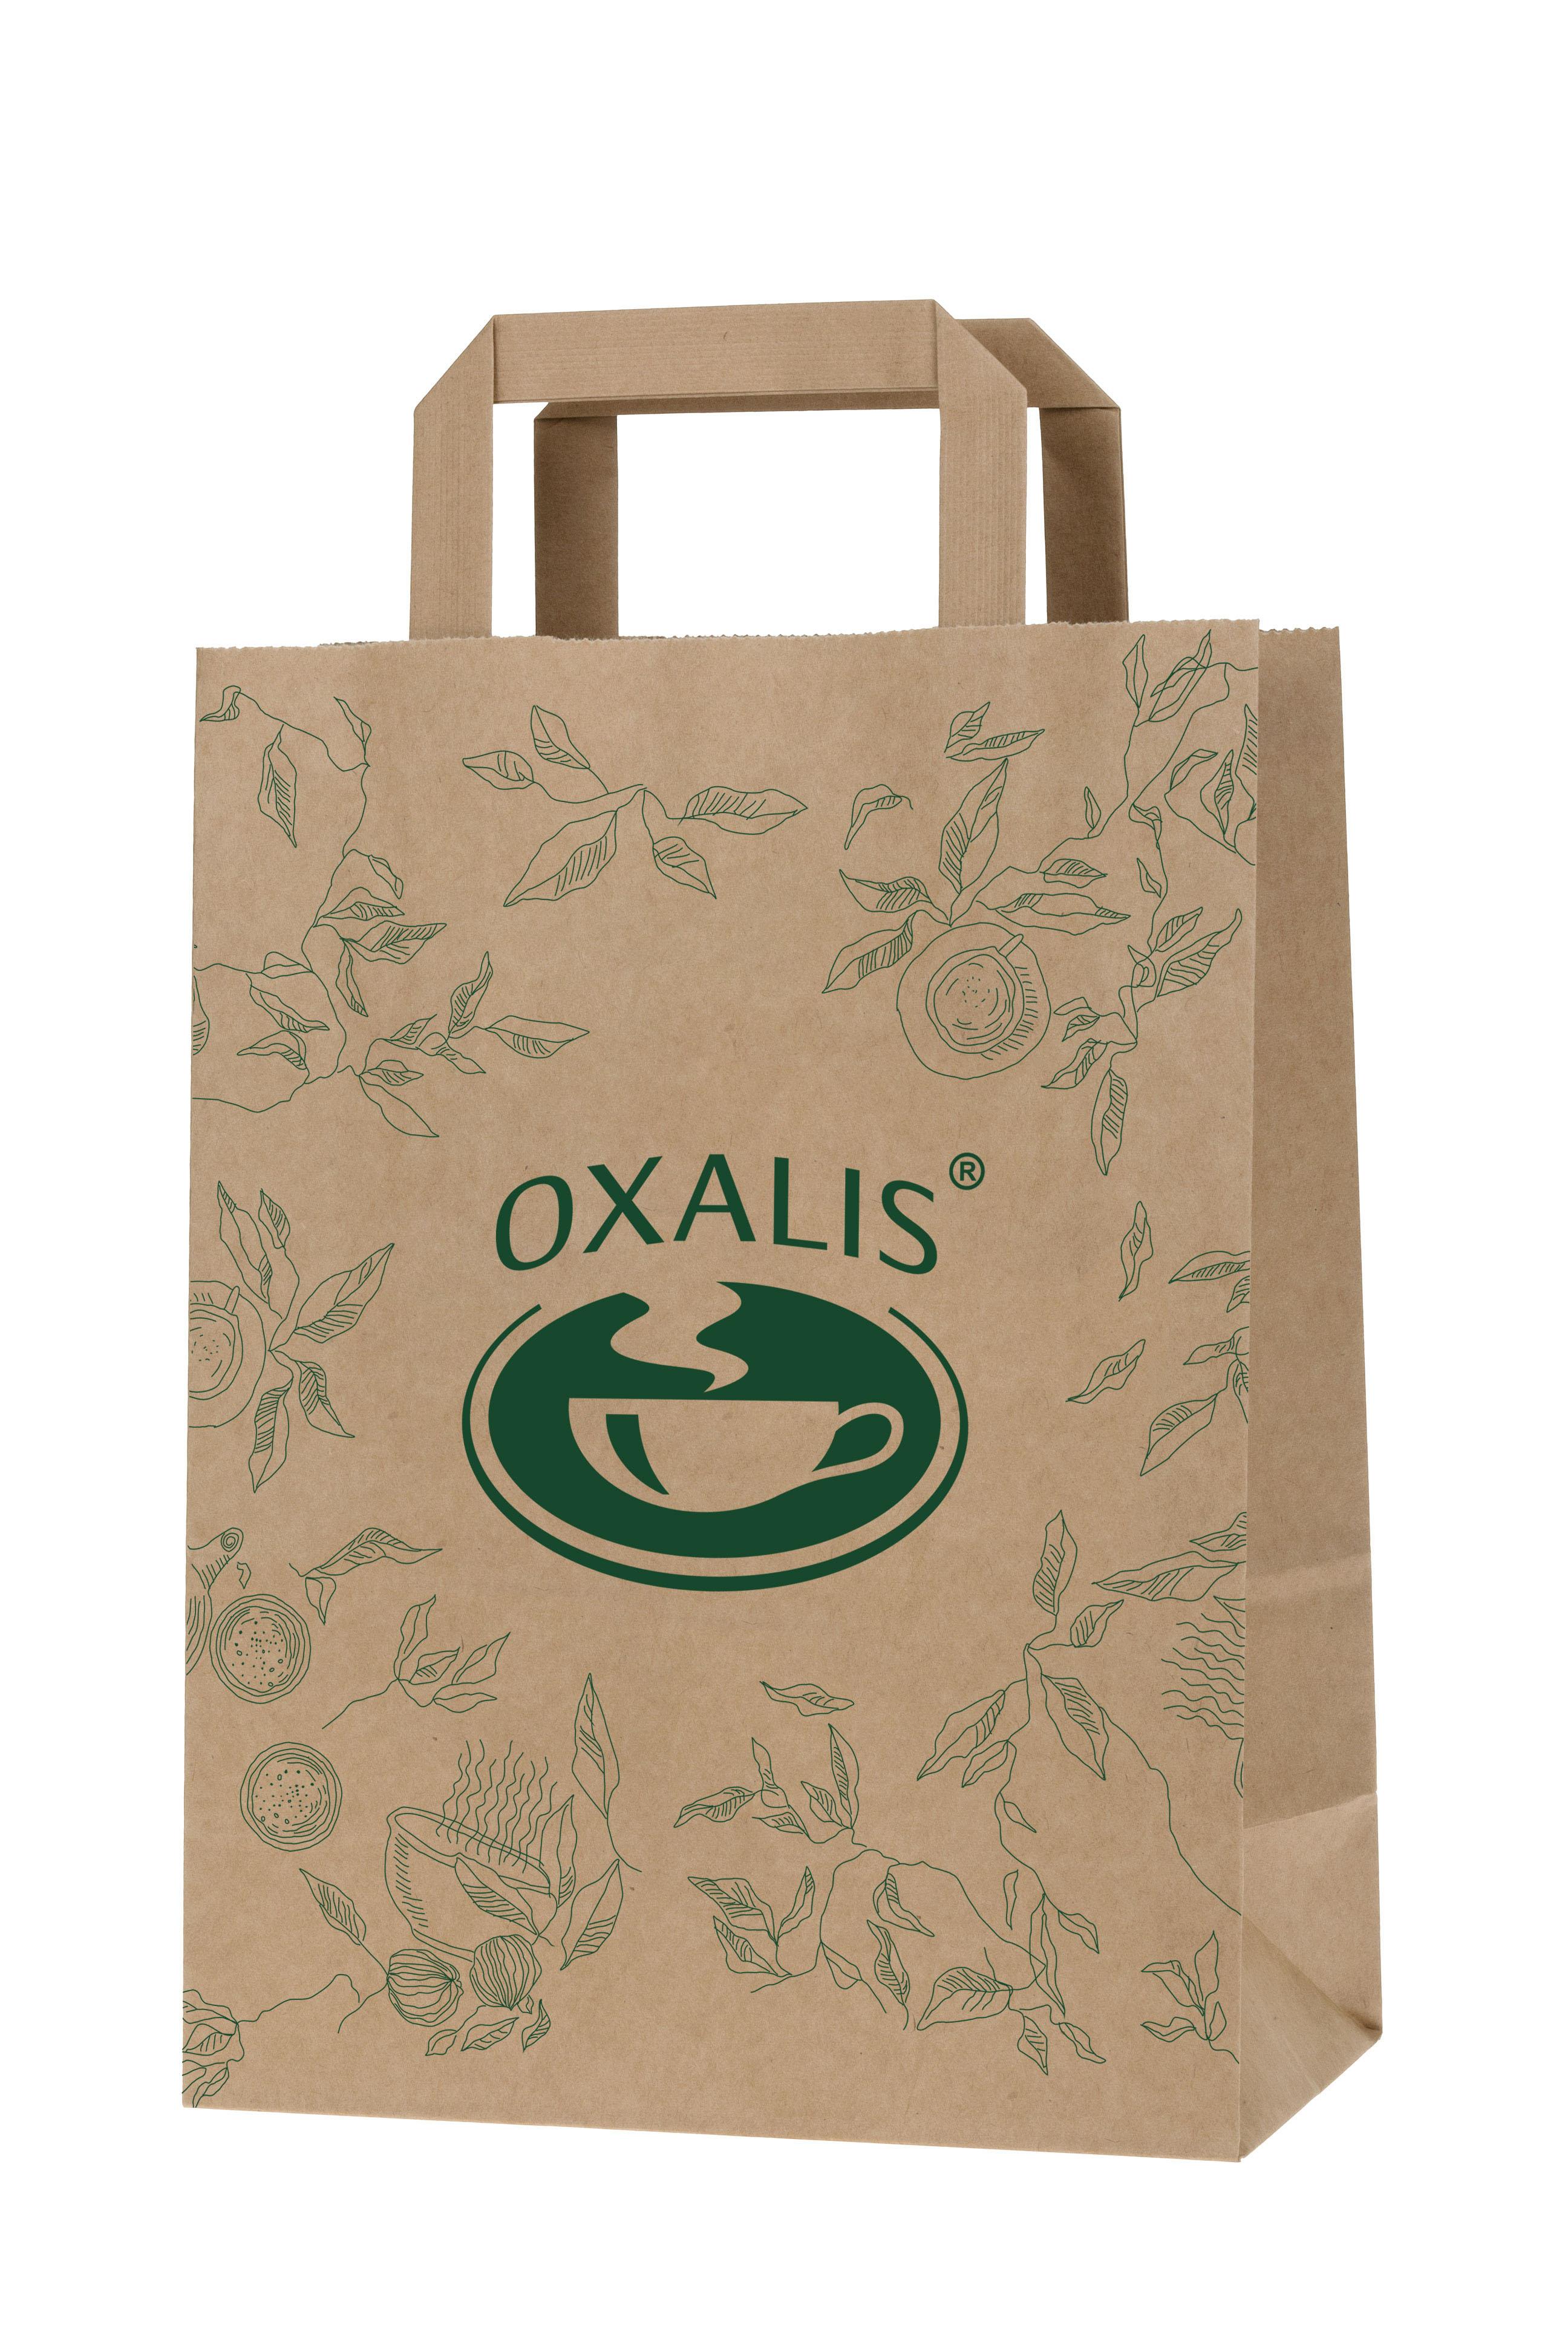 Oxalis Paper Shopping Bag - large